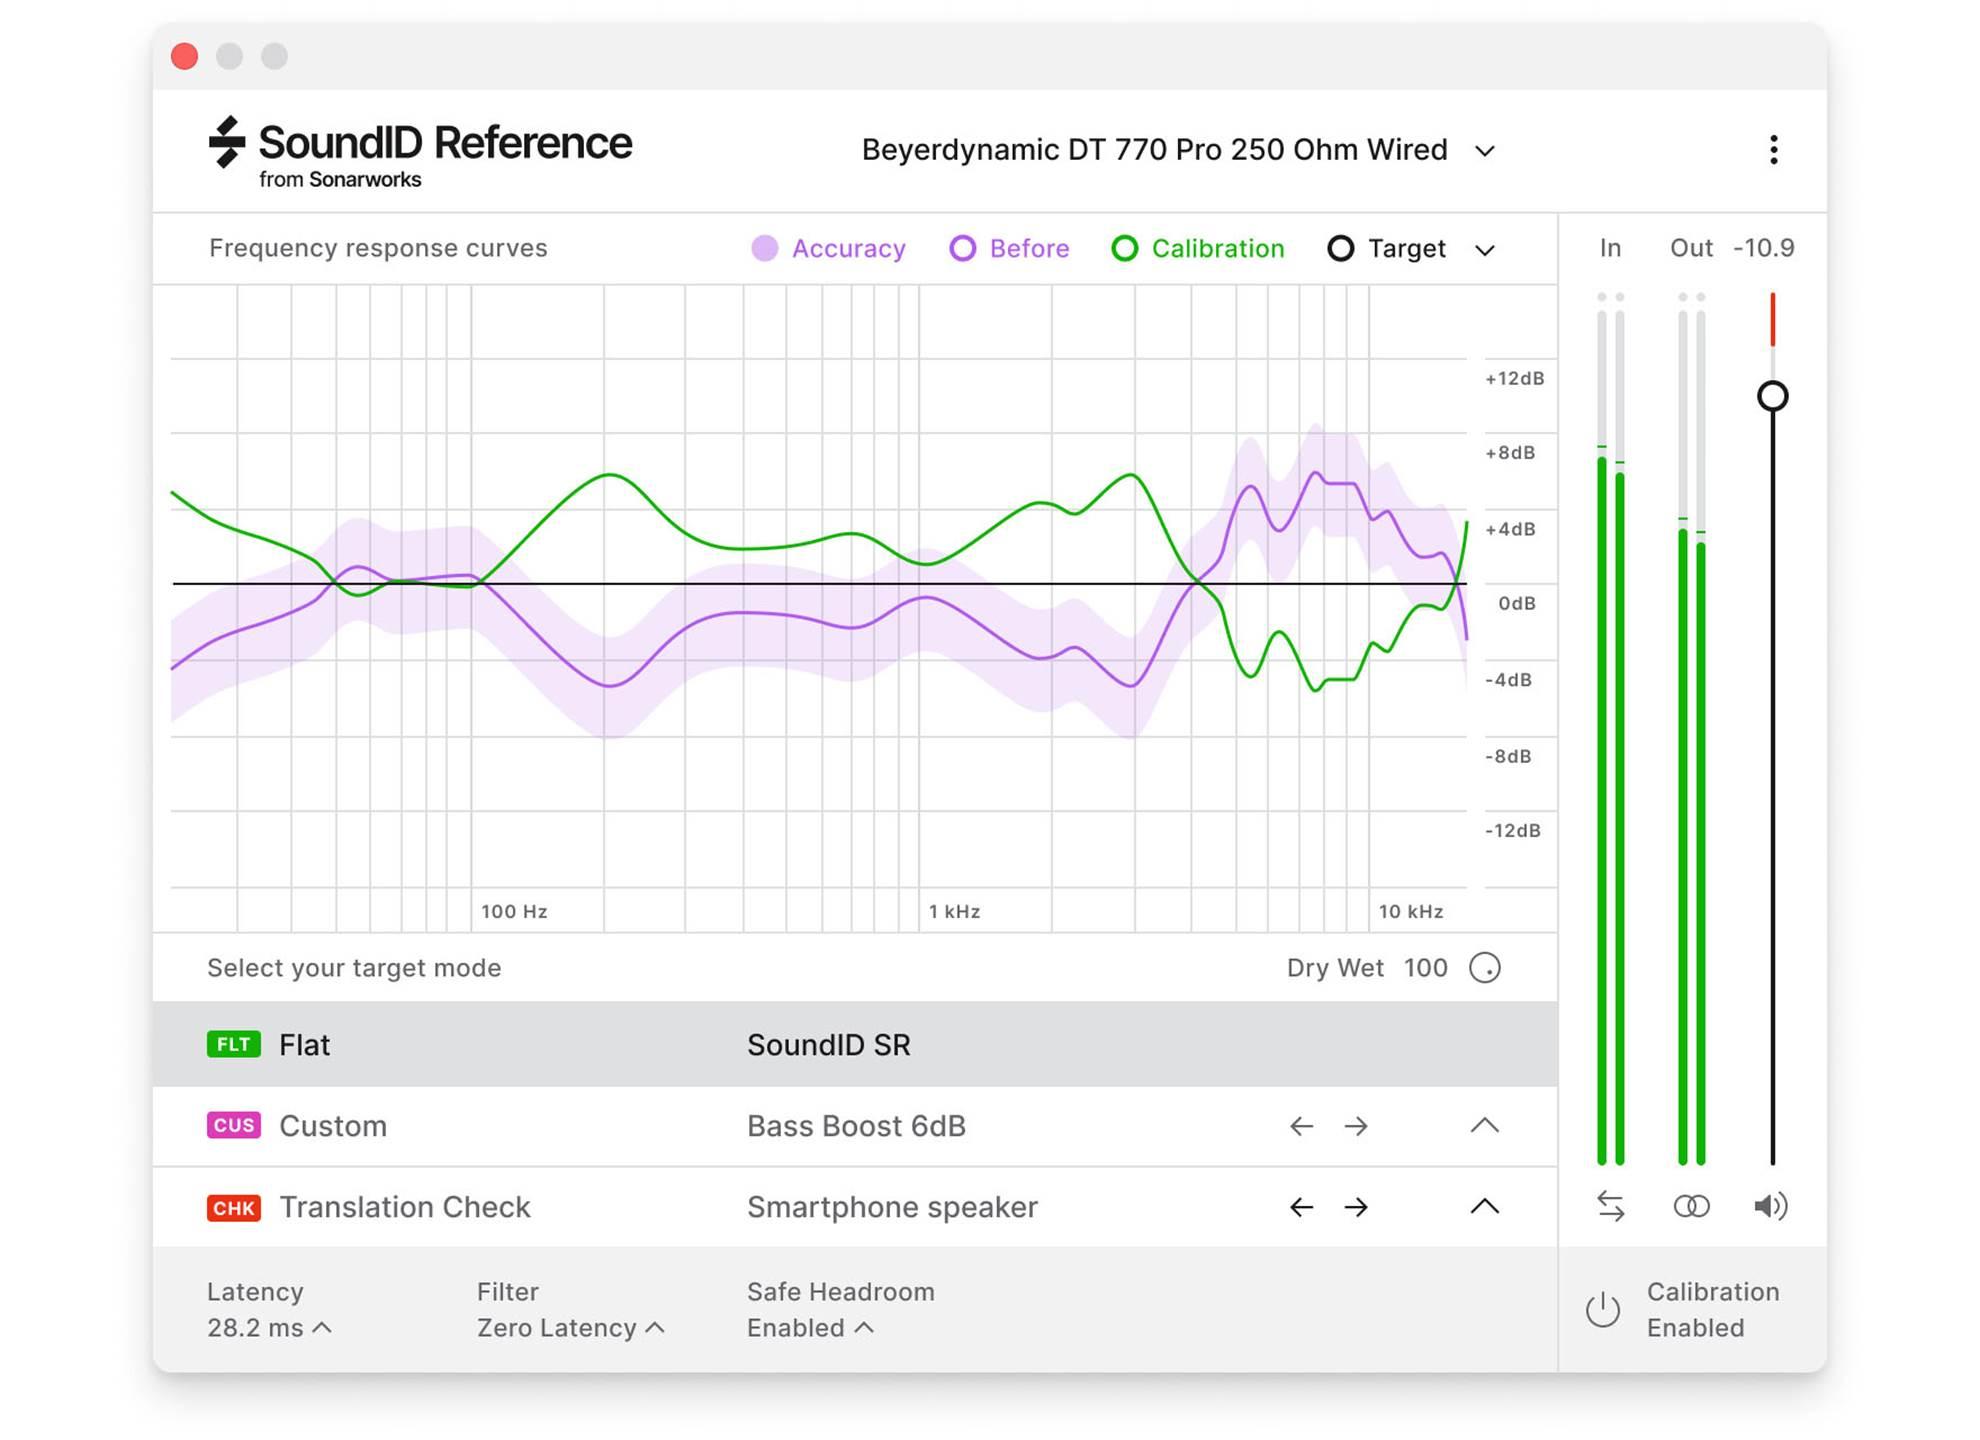 SoundID Reference Headphones Upgr Ref 4 Headphone Download